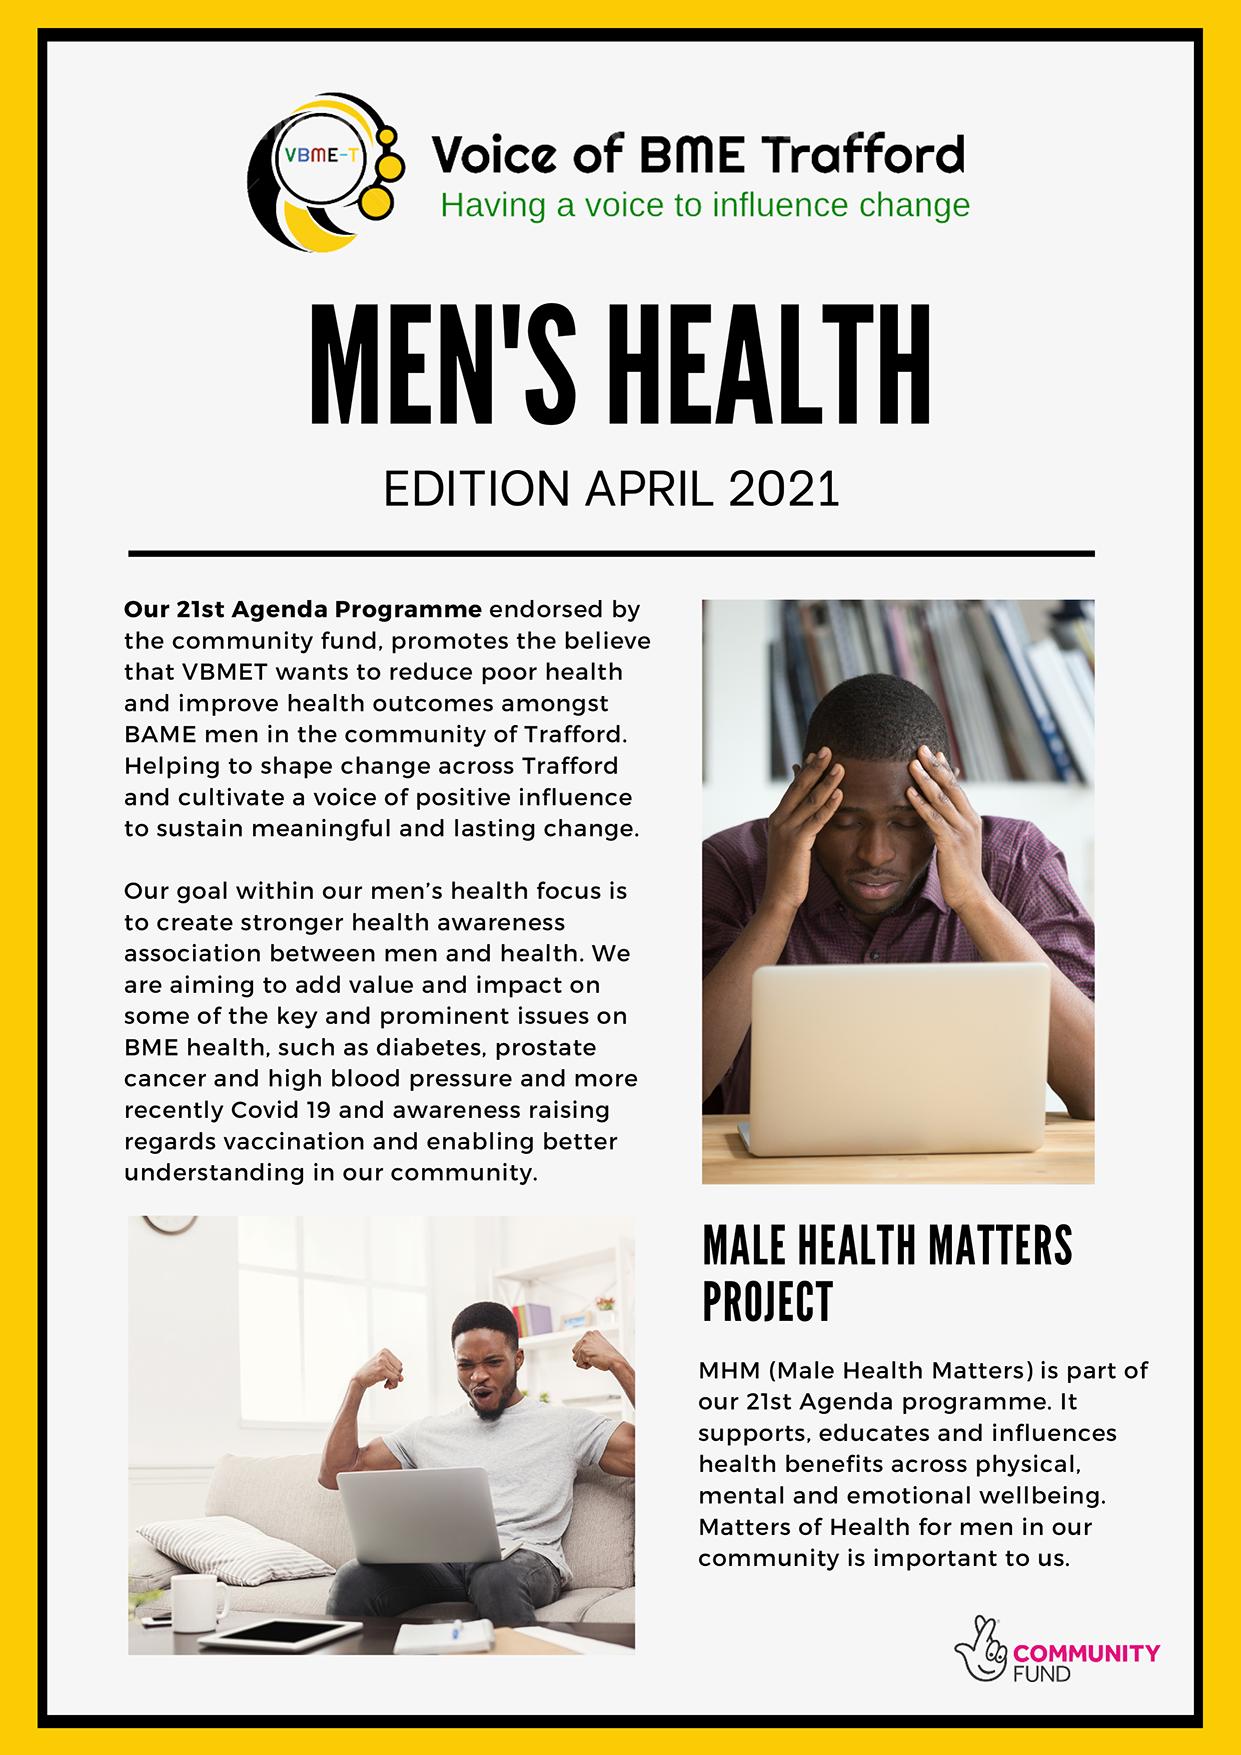 https://voicebmet.co.uk/home/wp-content/uploads/2021/05/VBMET-BROCHURE-Mens-Health-002-1-2.png